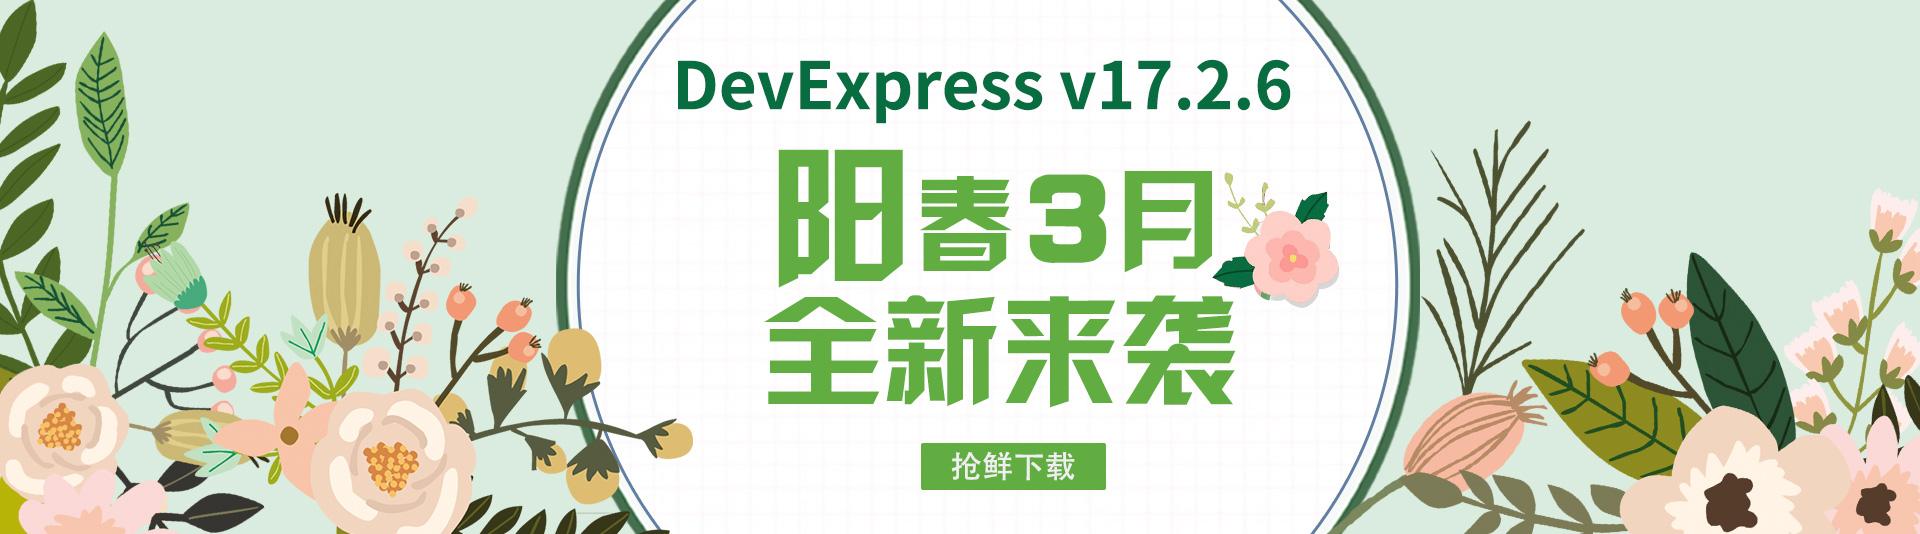 DevExpress v17.2.6发布